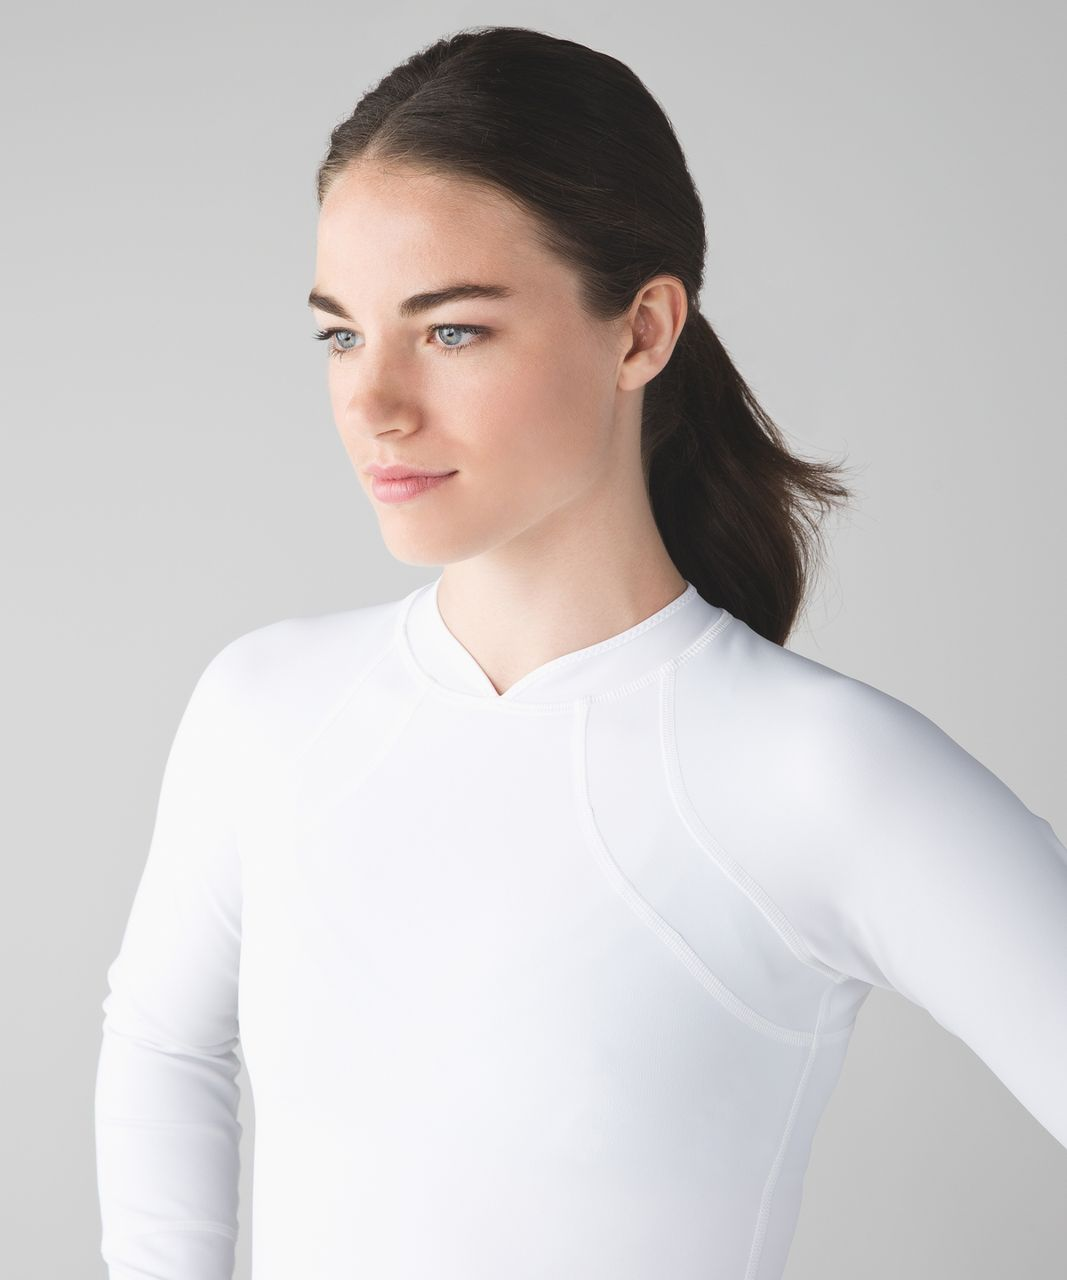 Lululemon Free To Paddle Top - White